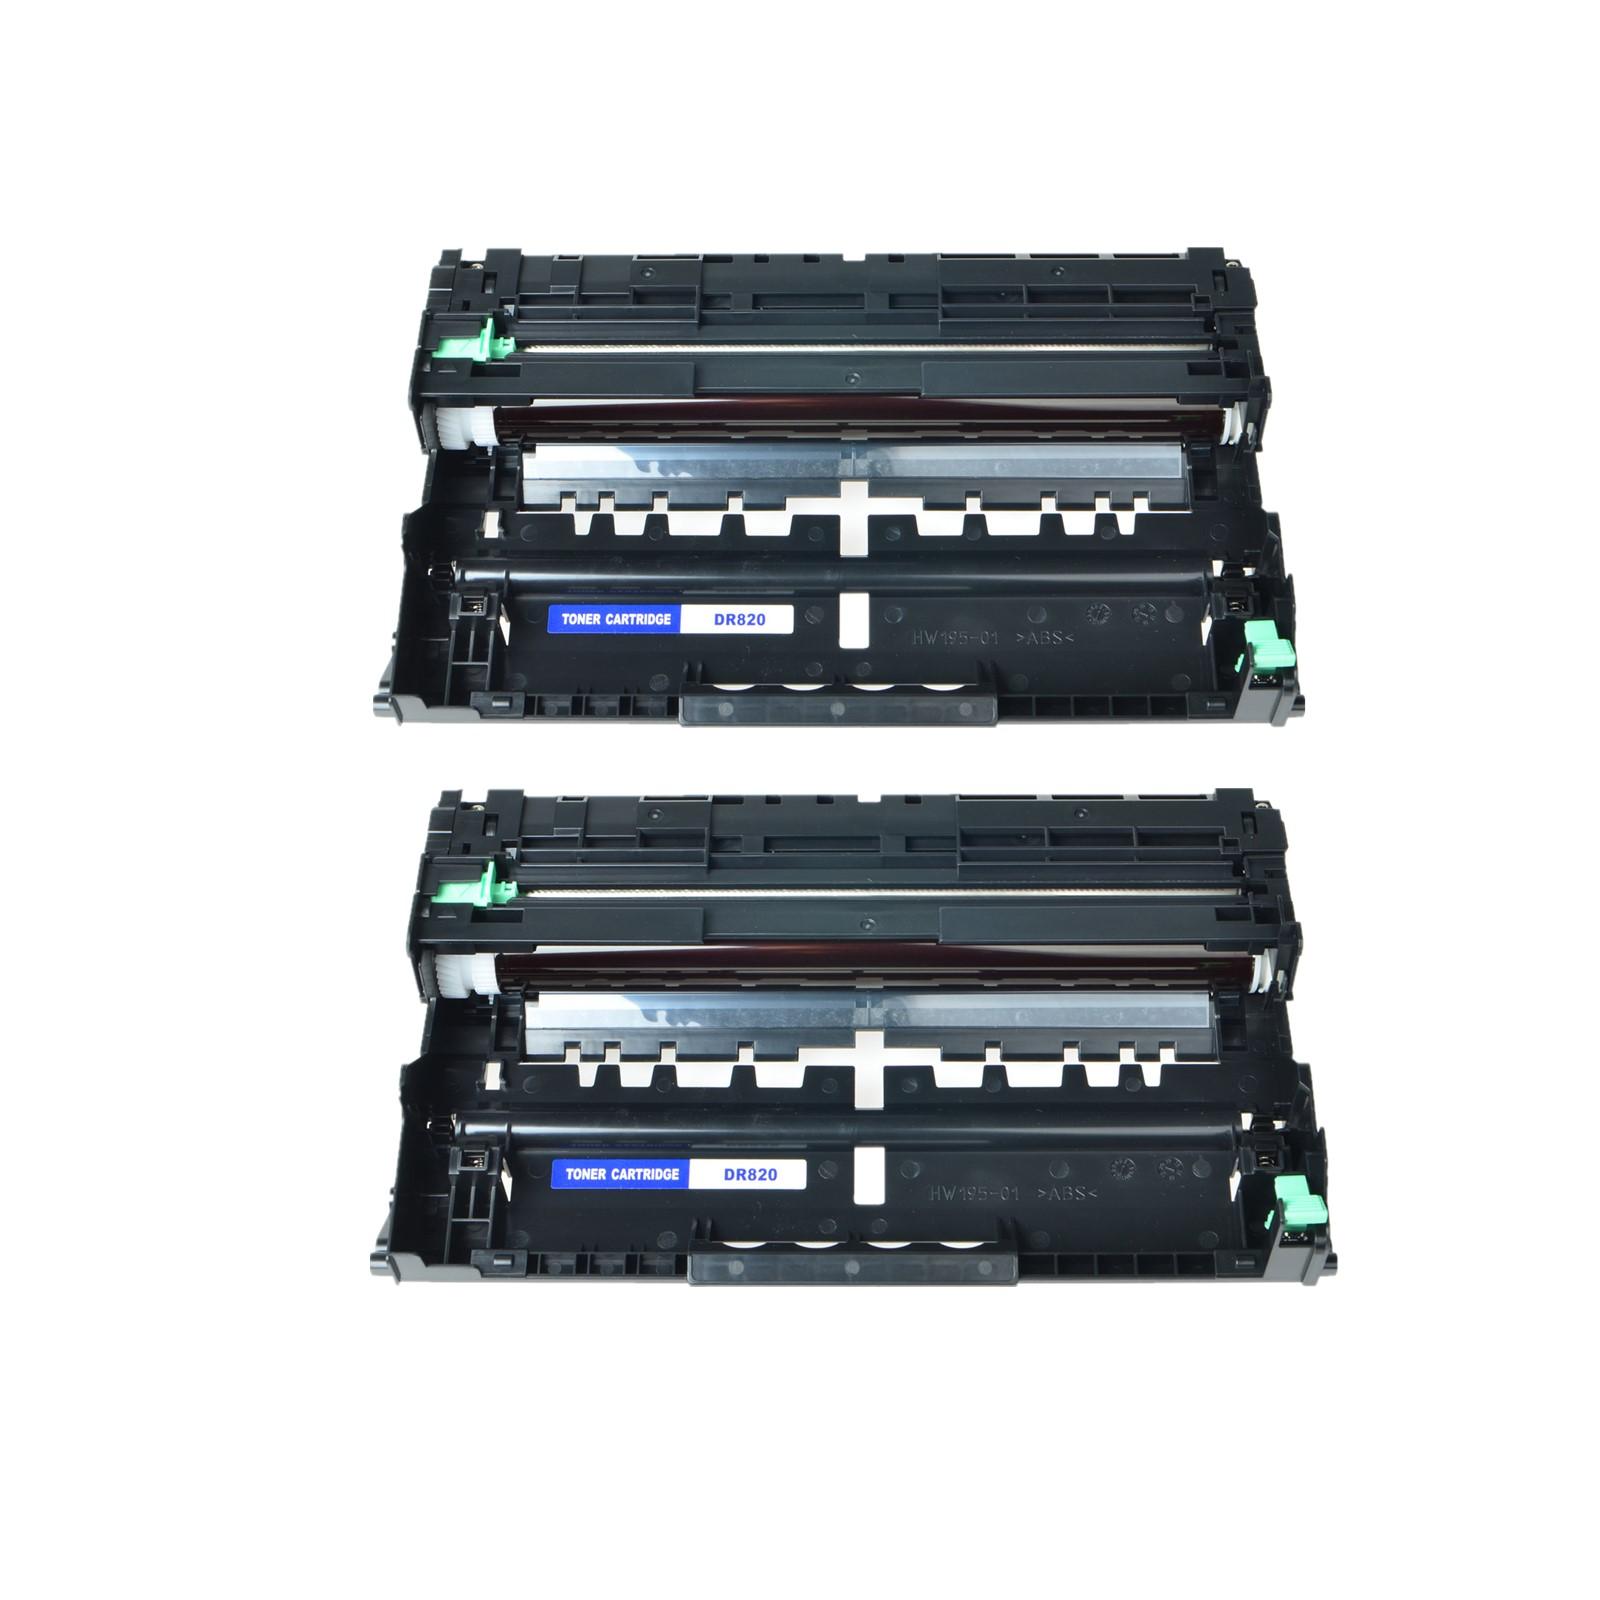 2PK DR820 Drum Unit For Brother HL-L6200DW L6200DWT L6250DW MFC-L5900DW L6700DW